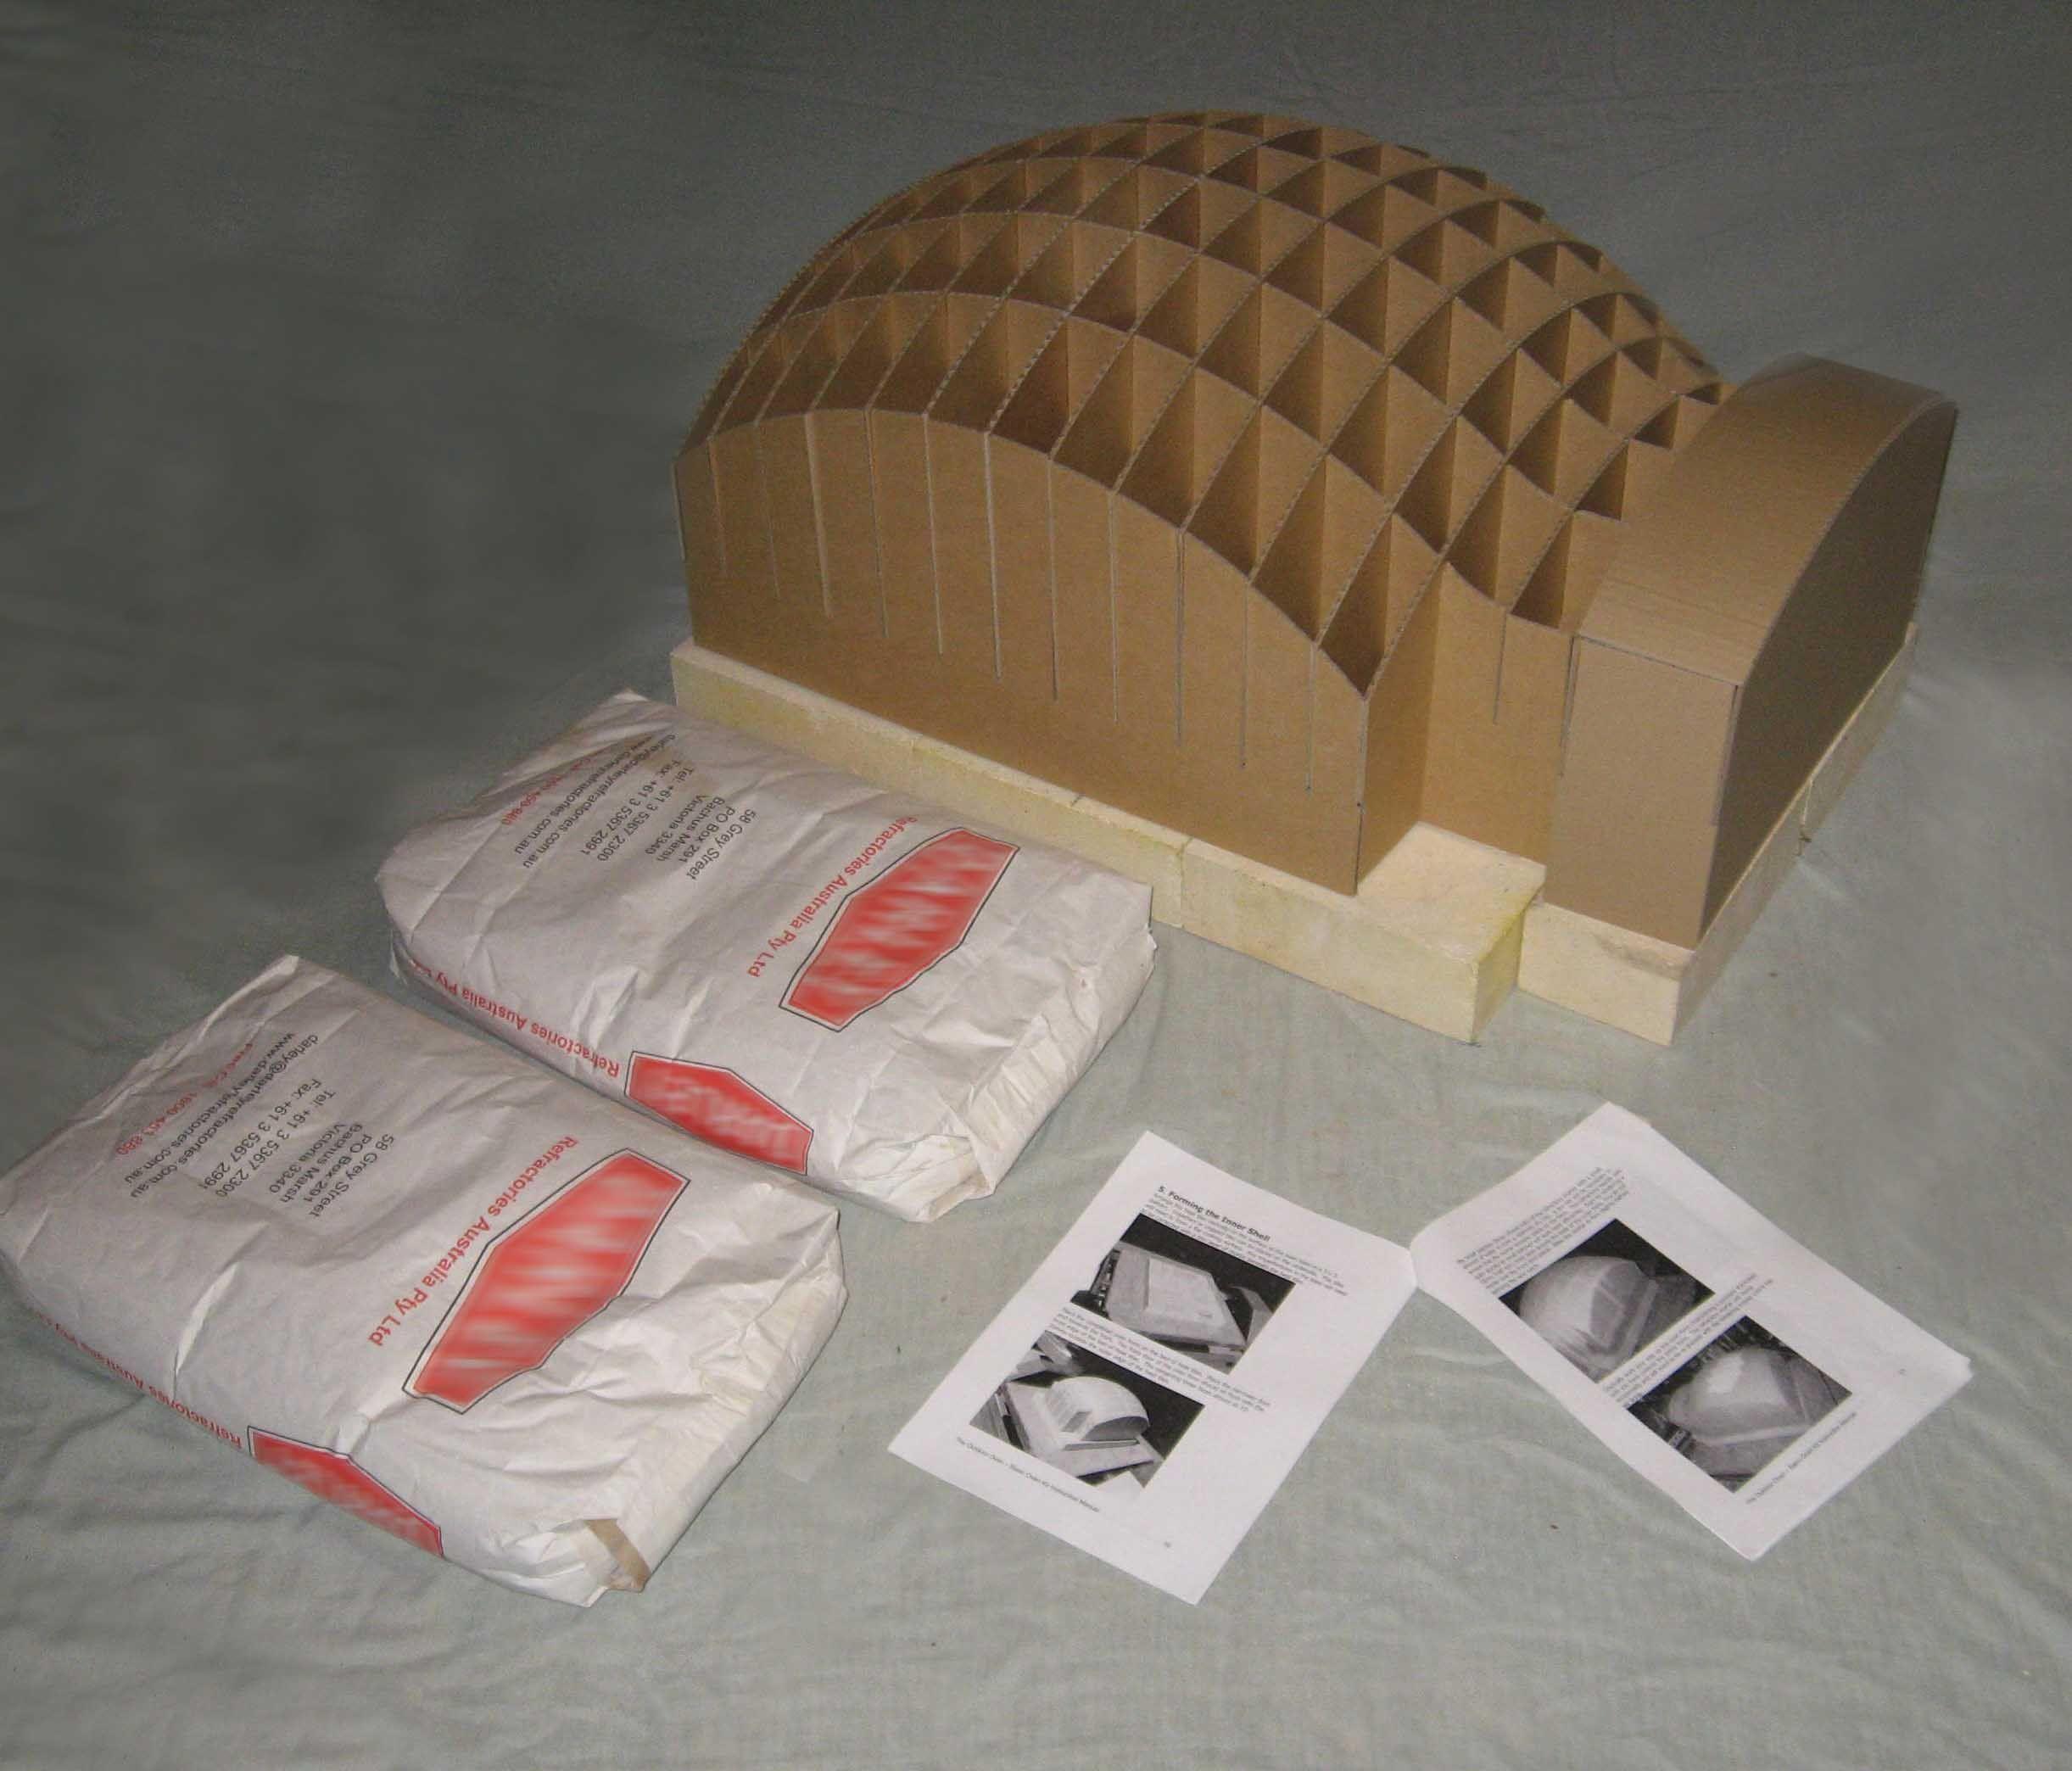 Diy pizza oven kit